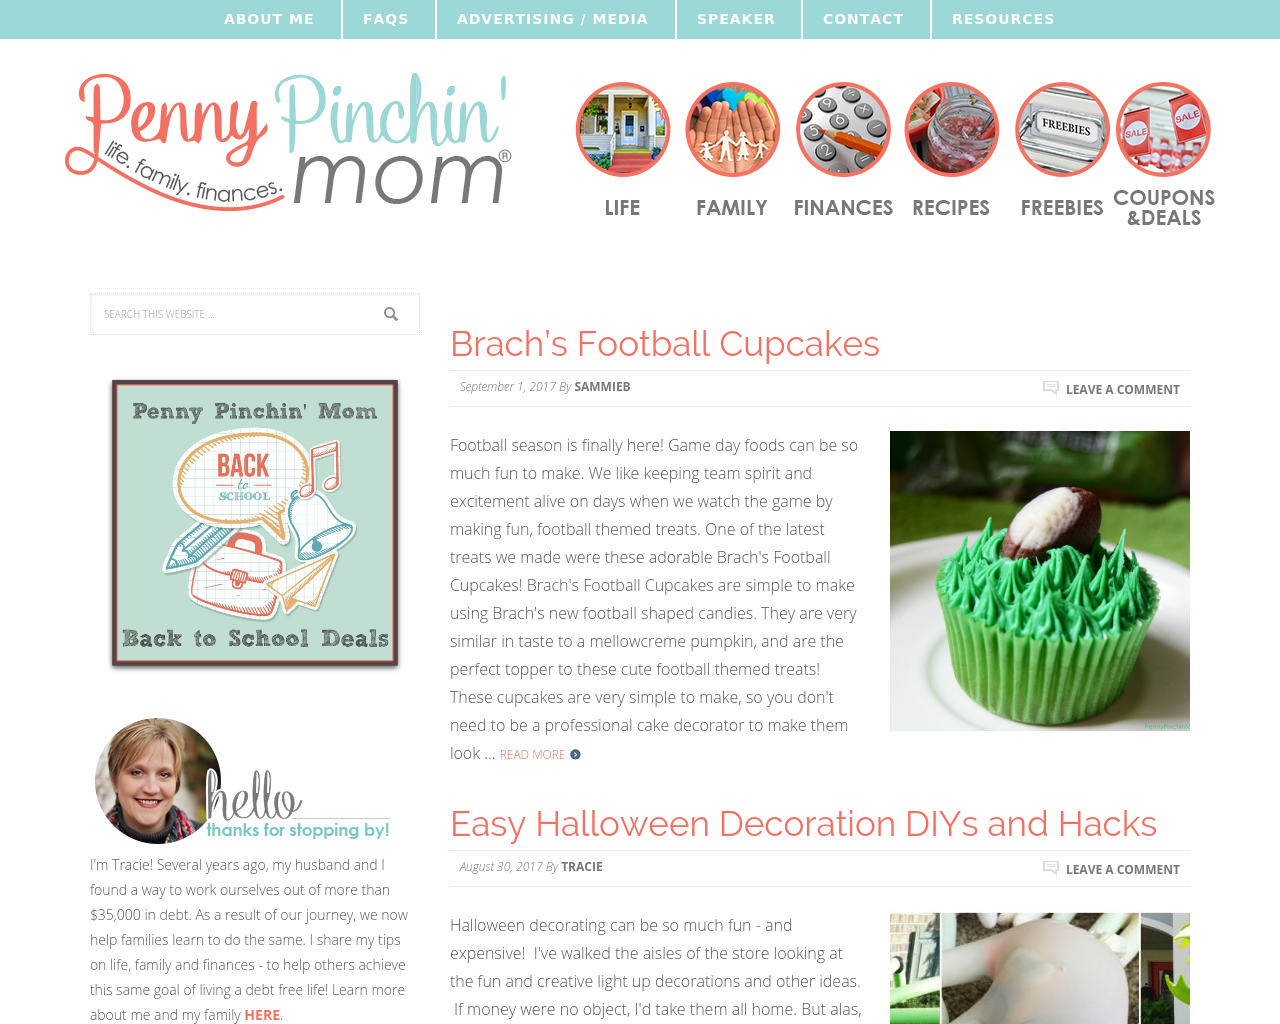 Pennypinchinmom.com-Advertising-Reviews-Pricing